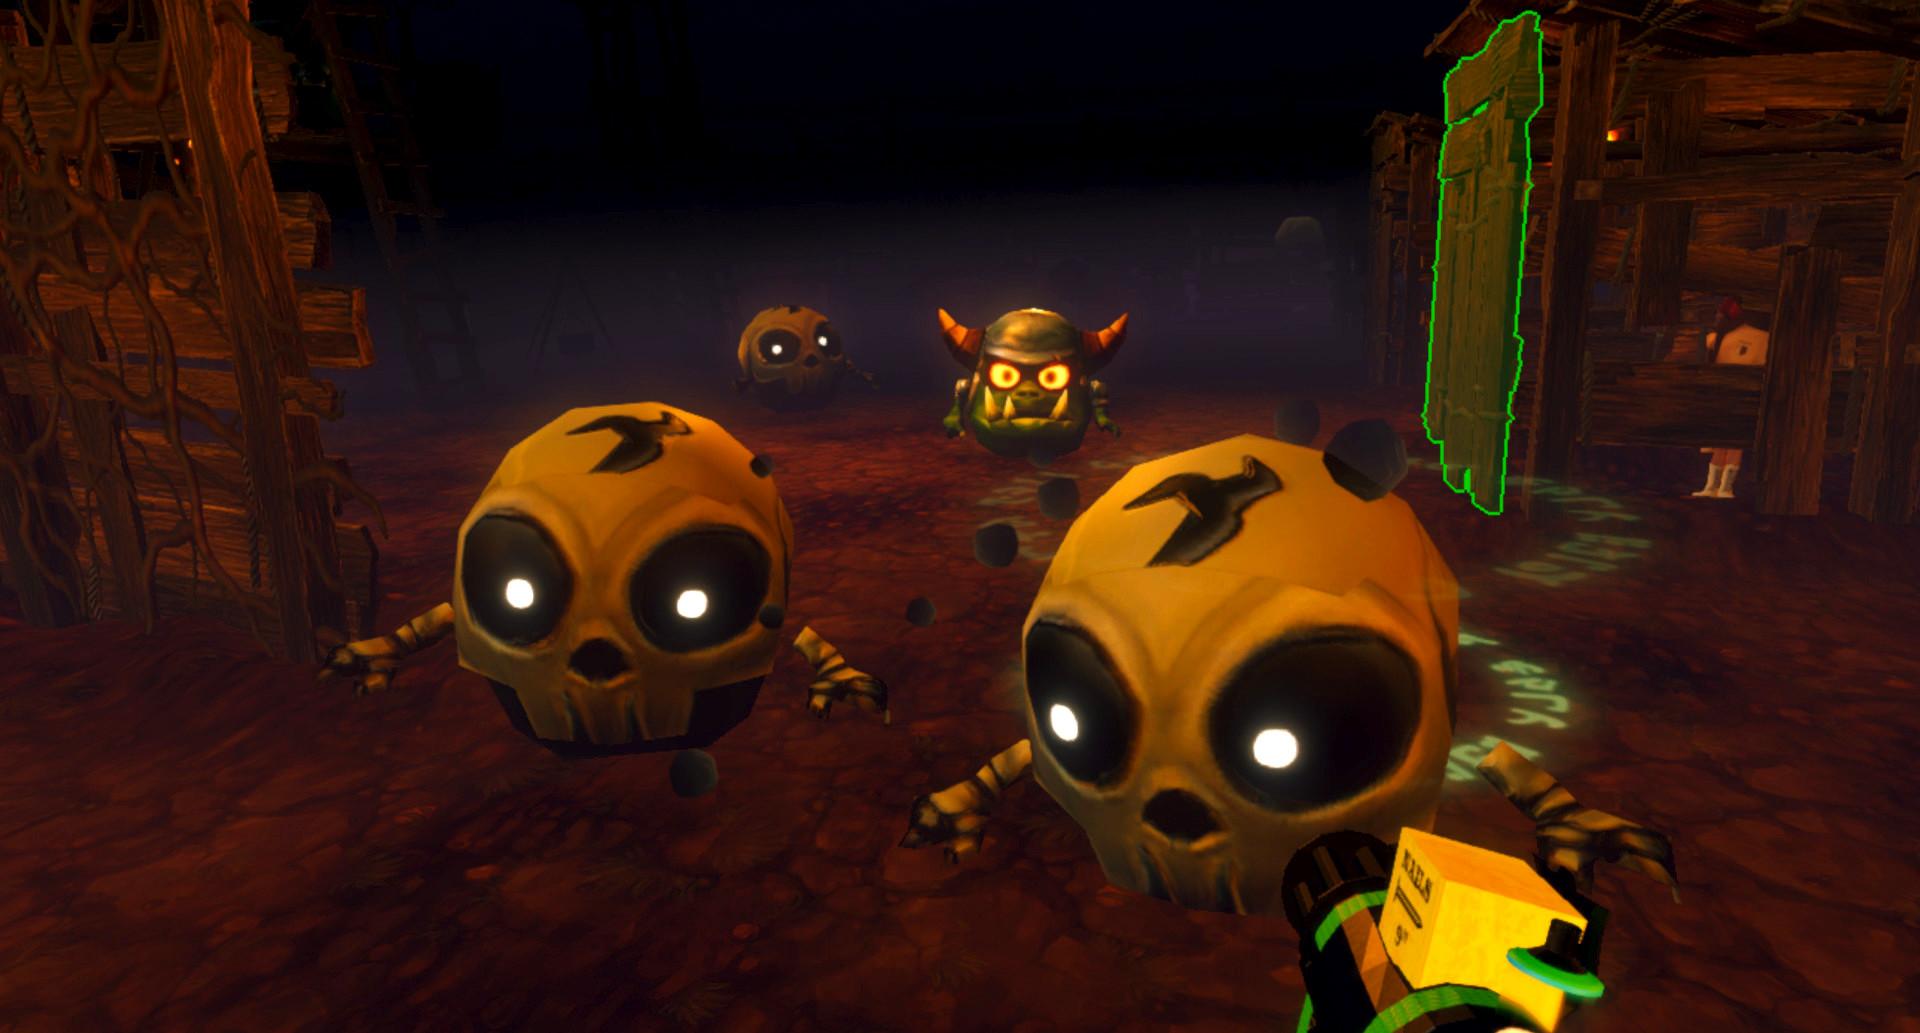 Spooky Night 2 screenshot